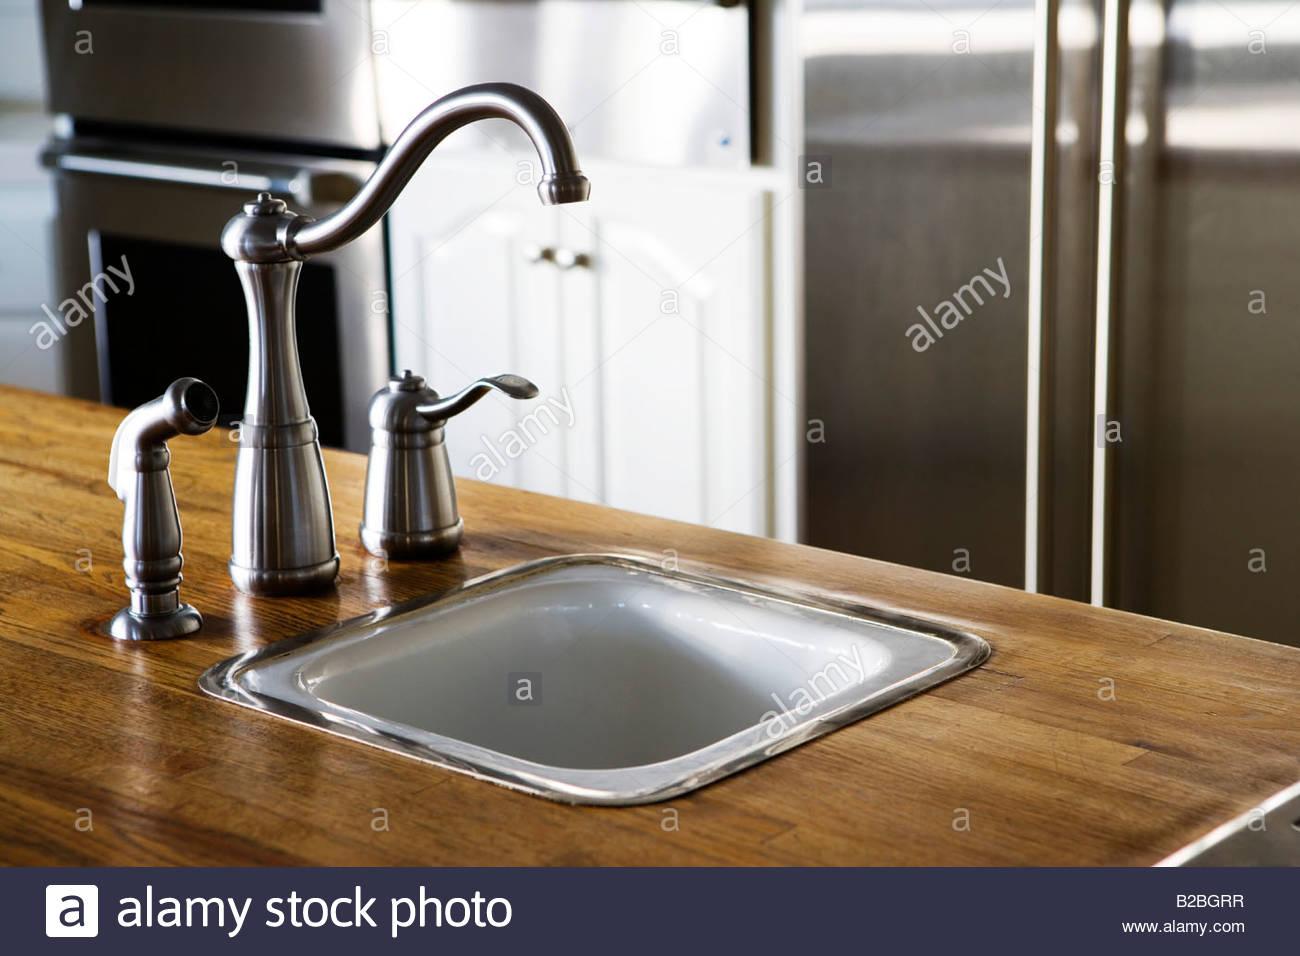 stock photo chrome kitchen sink faucet kitchen sink faucet Chrome Kitchen Sink Faucet